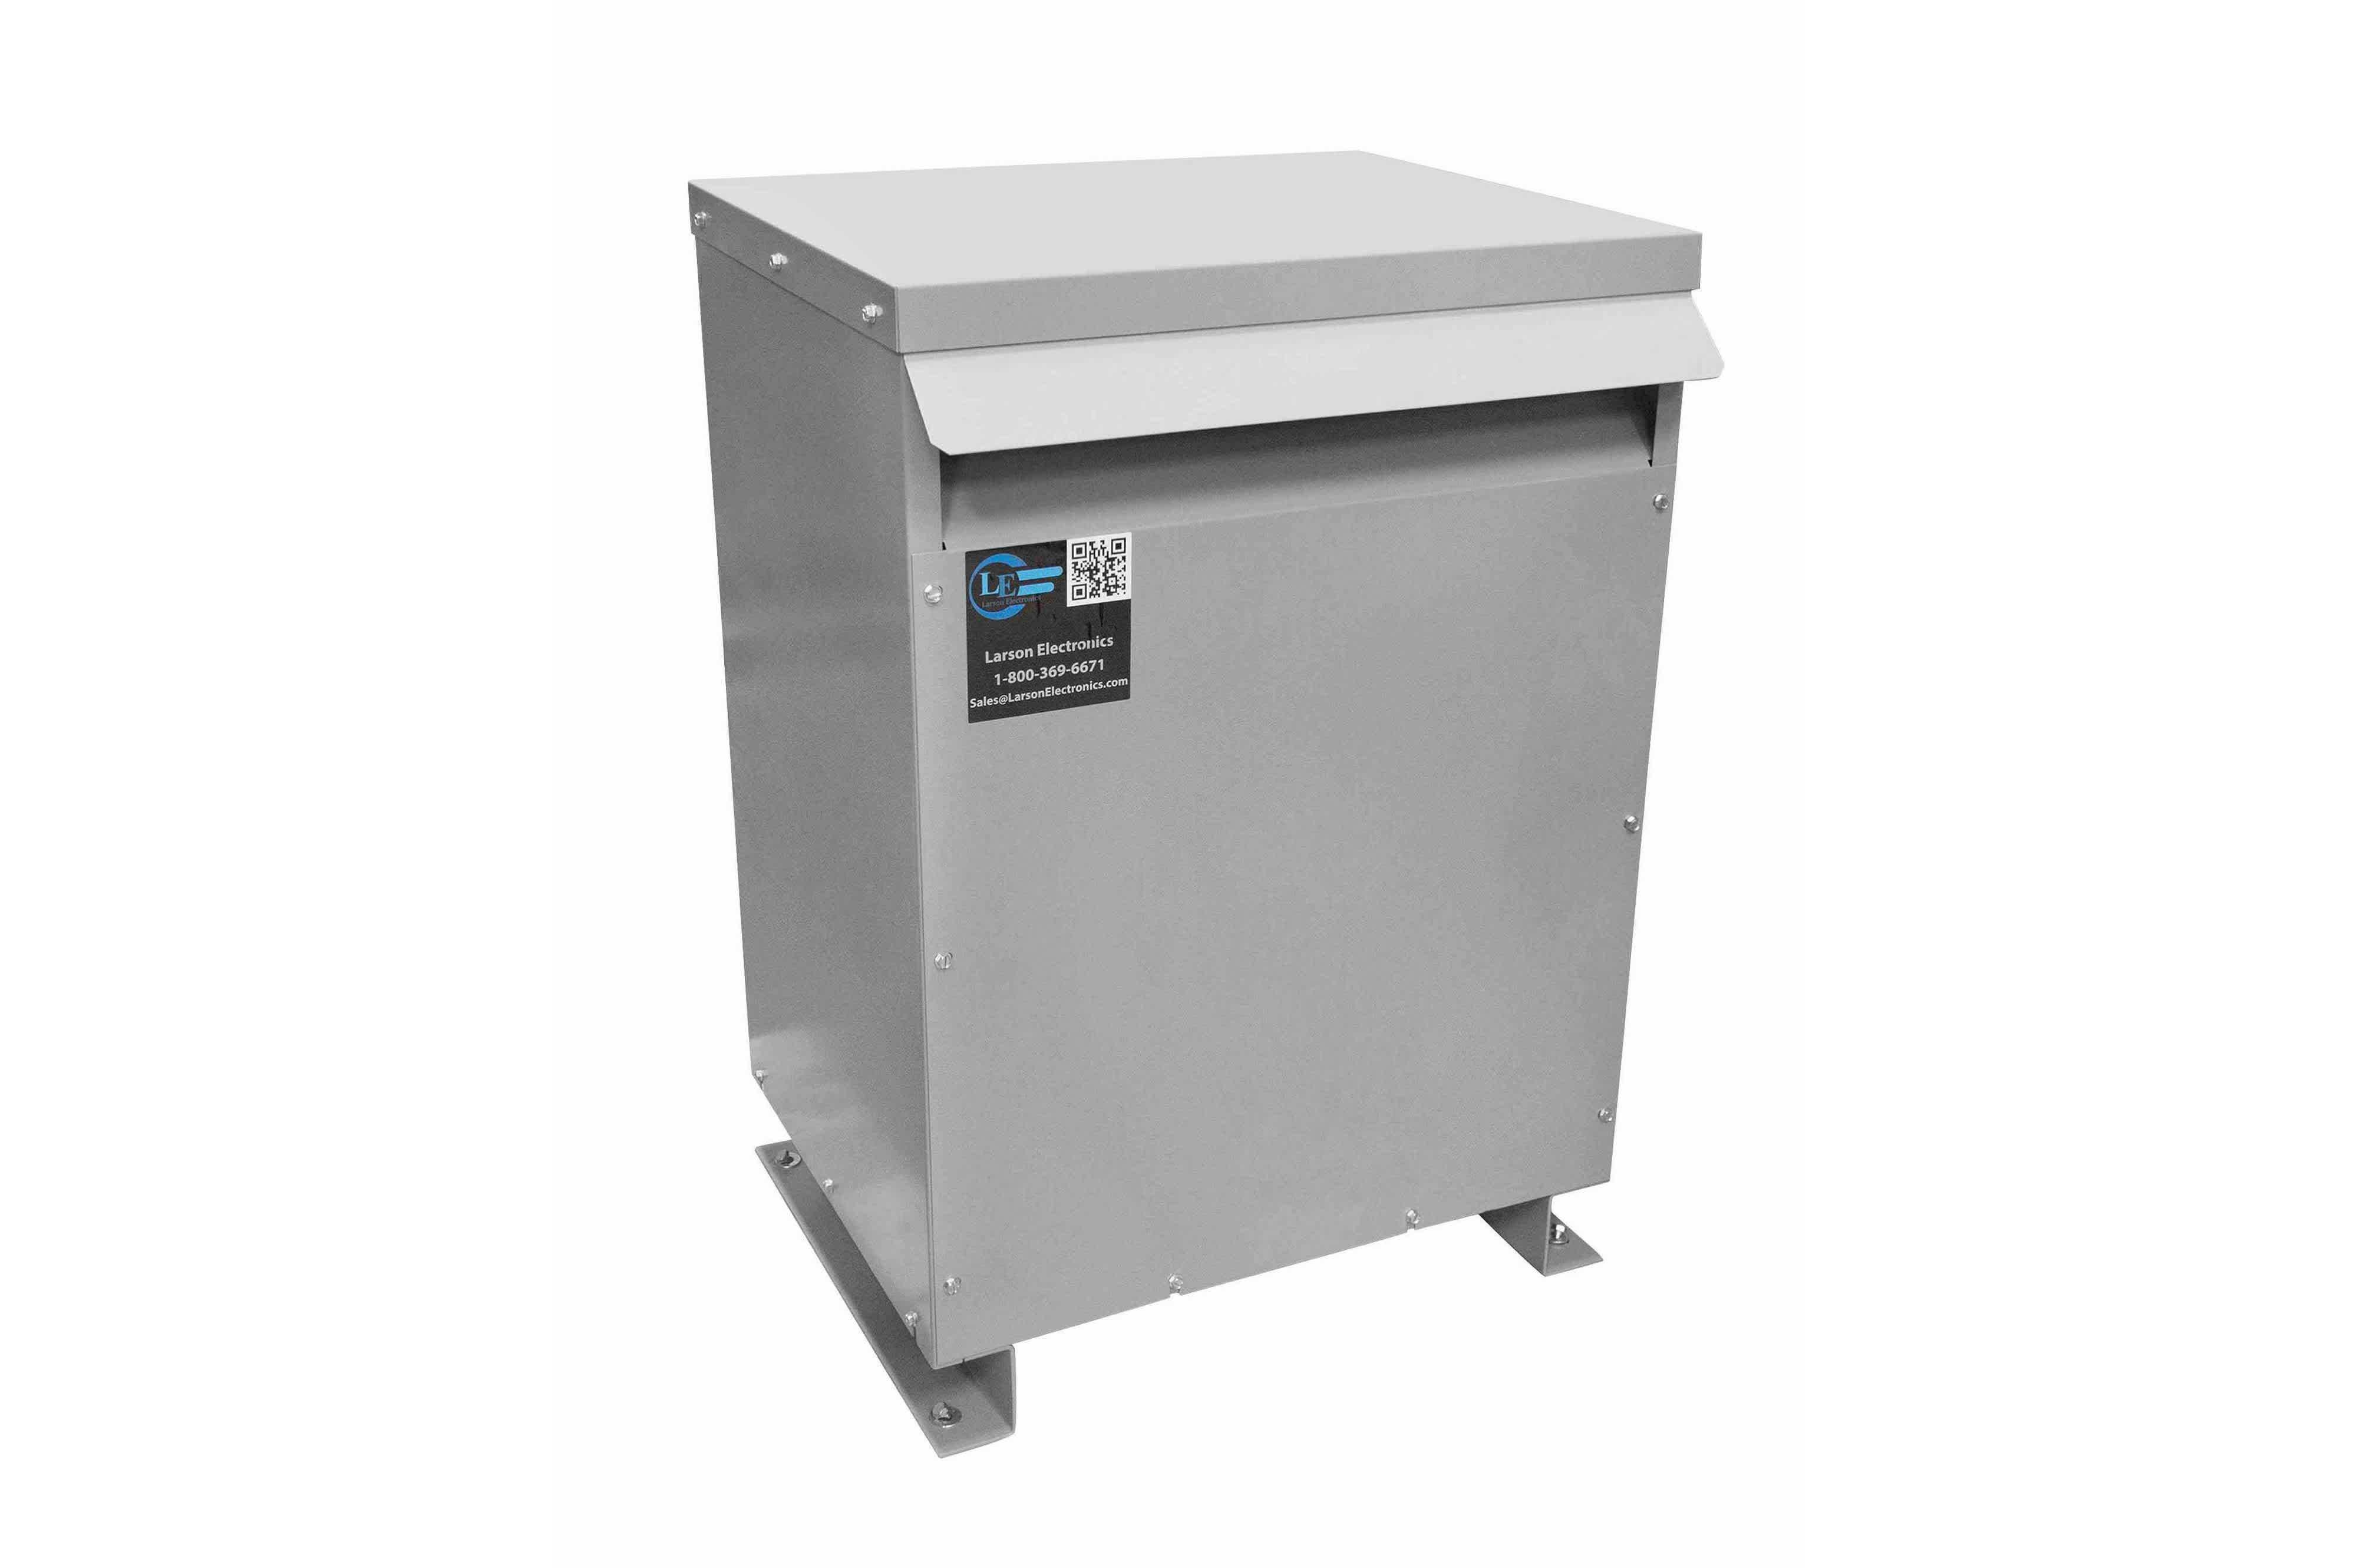 100 kVA 3PH DOE Transformer, 575V Delta Primary, 400Y/231 Wye-N Secondary, N3R, Ventilated, 60 Hz